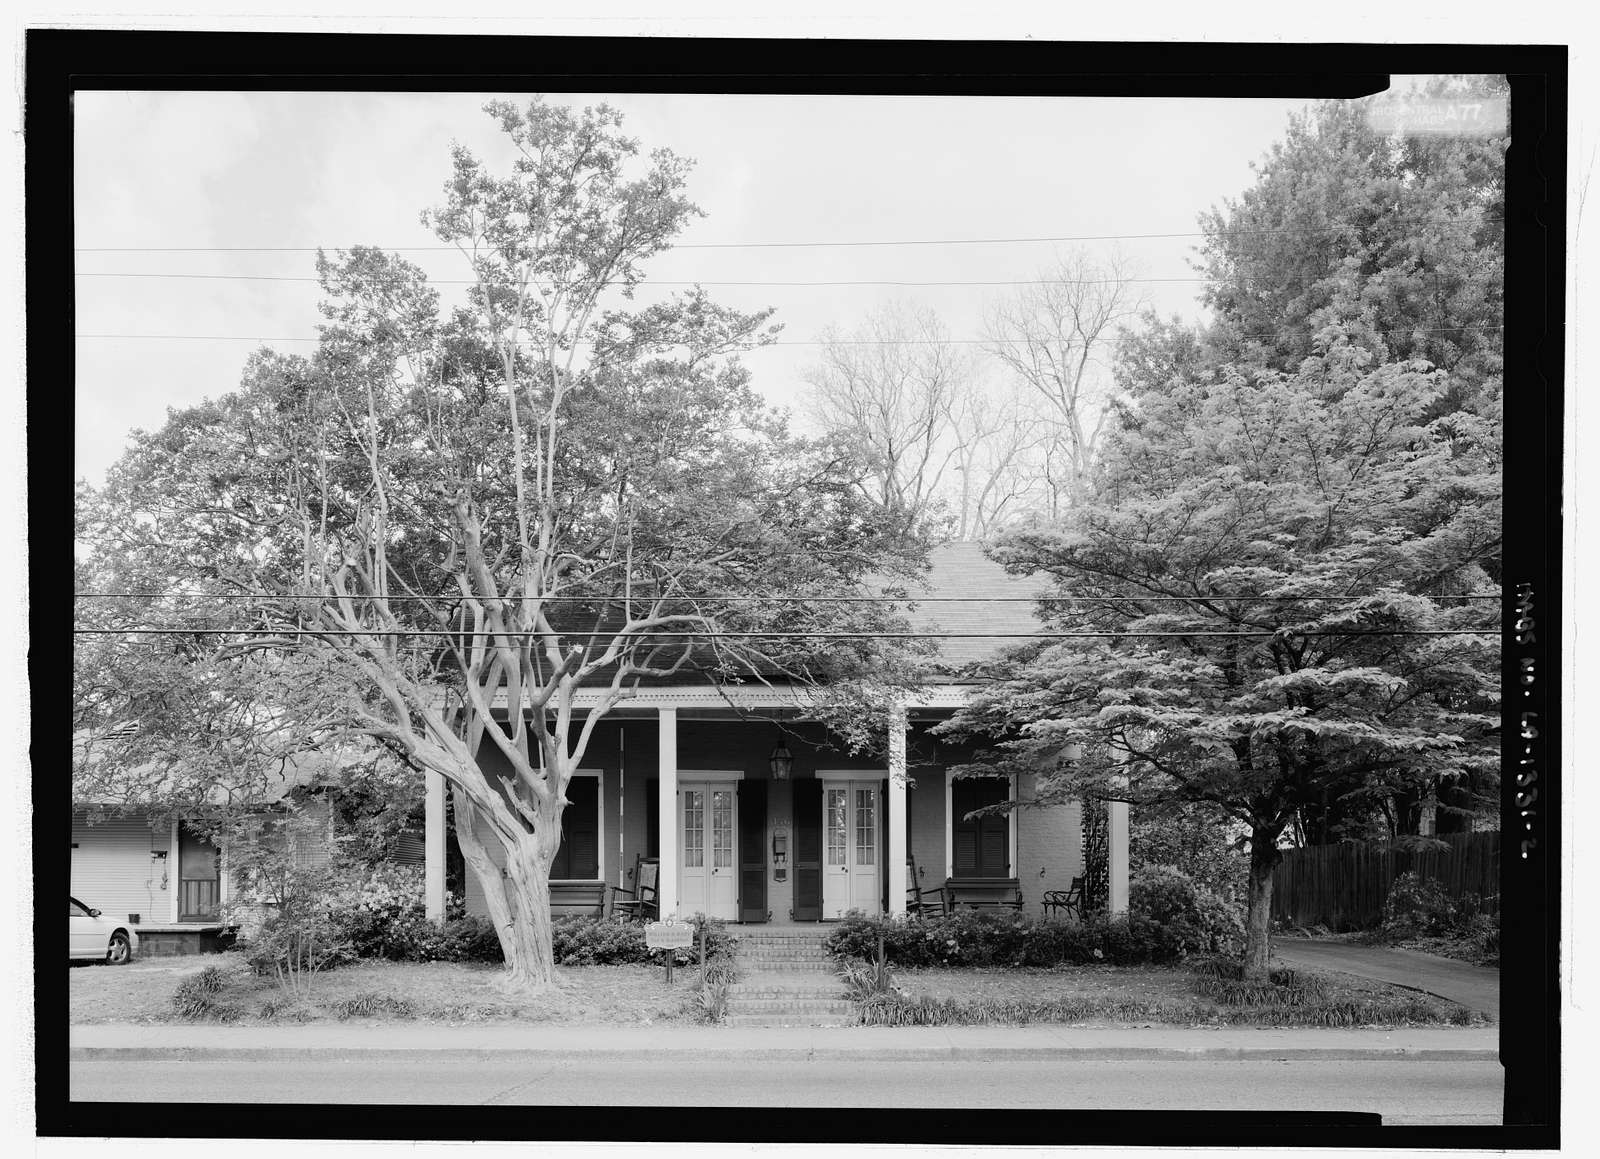 Dranguet-Ackel House, 146 Jefferson Street, Natchitoches, Natchitoches Parish, LA